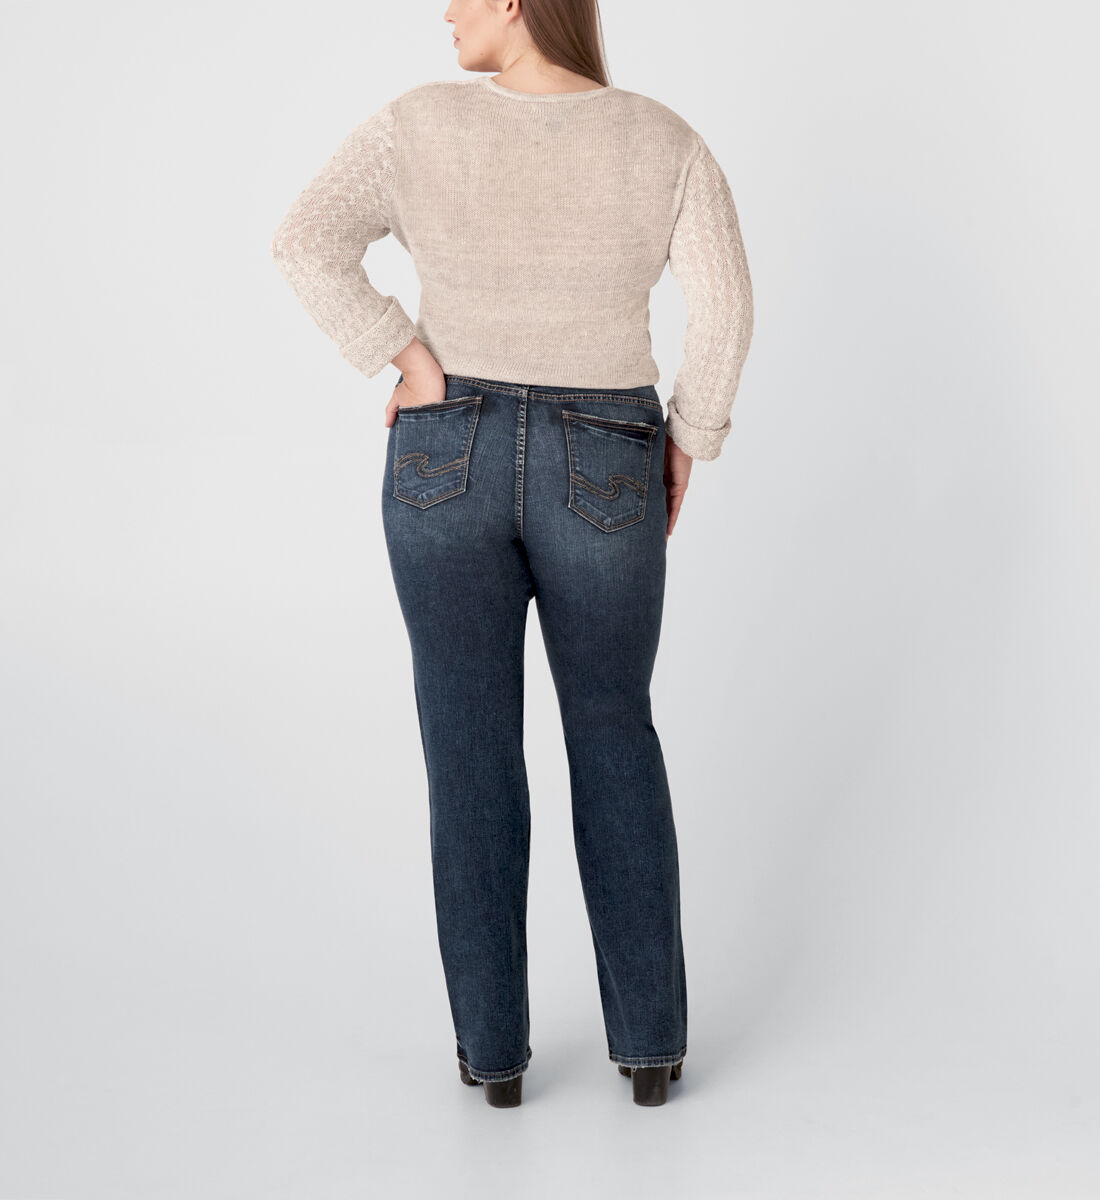 Elyse Mid Rise Slim Bootcut Jeans Plus Size Back